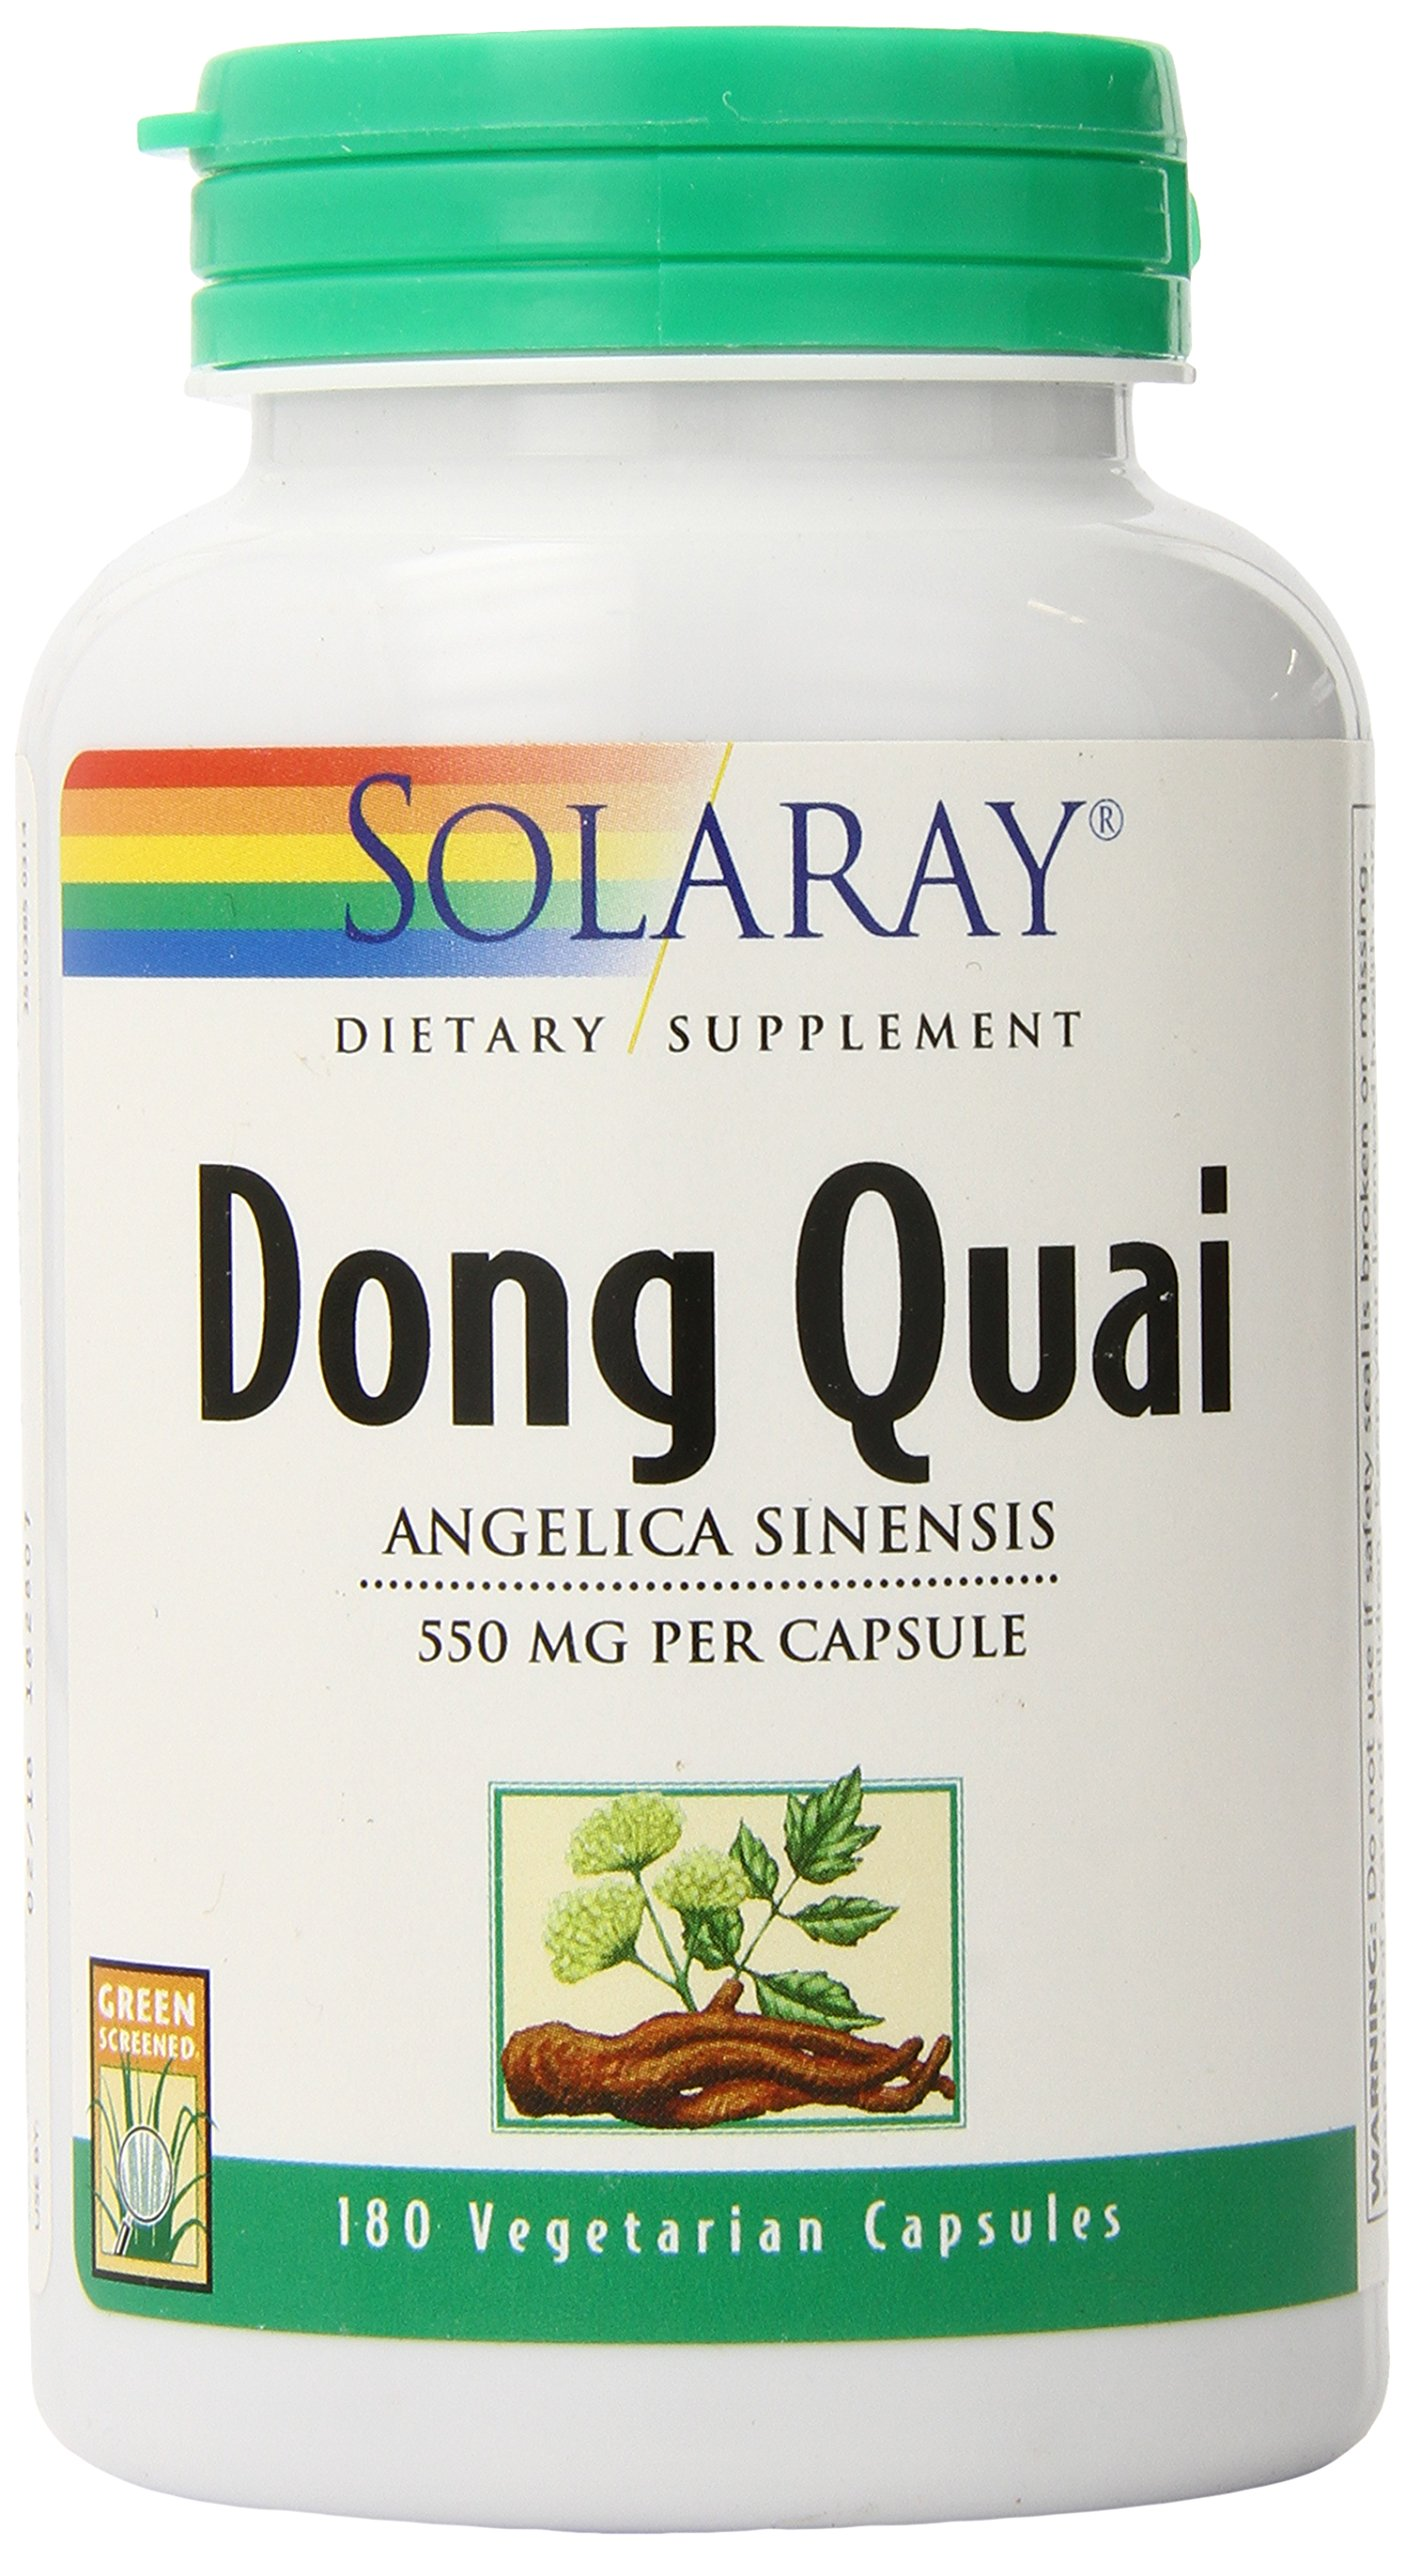 Solaray Dong Quai Capsules, 550 mg, 180 Count